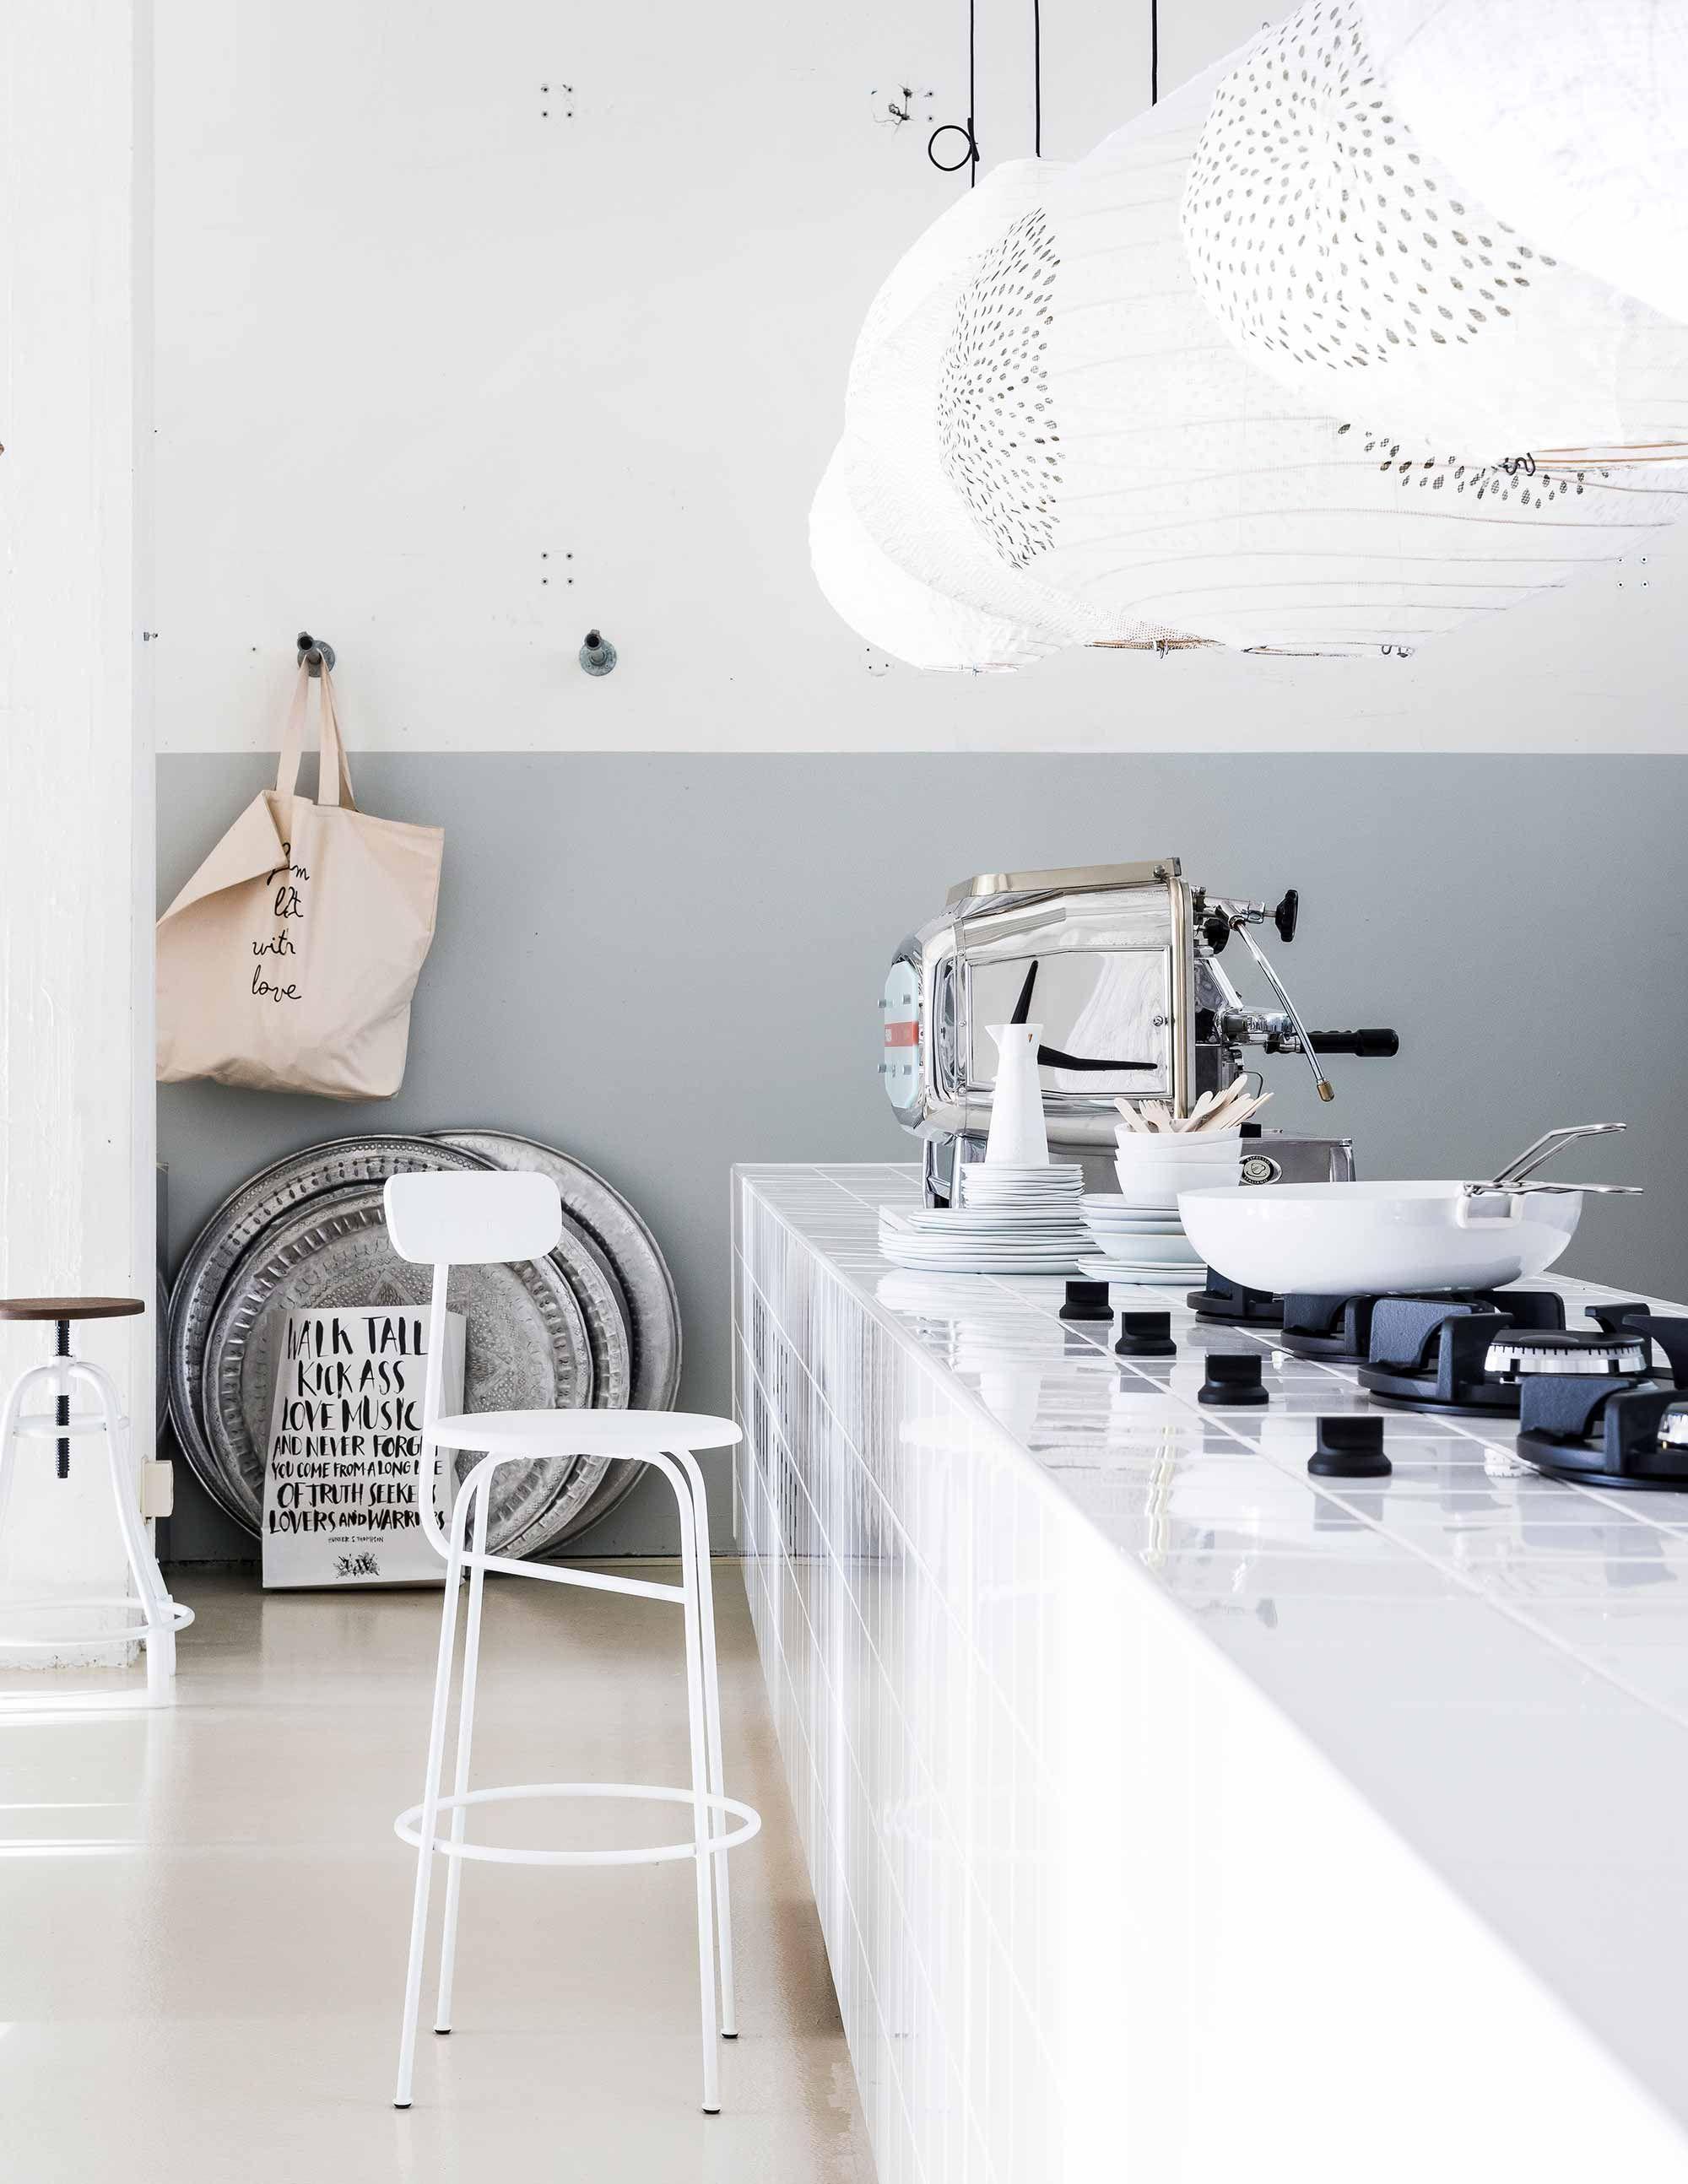 Keuken | kitchen vtwonen 04-2017 | Fotografie Sjoerd Eickmans ...